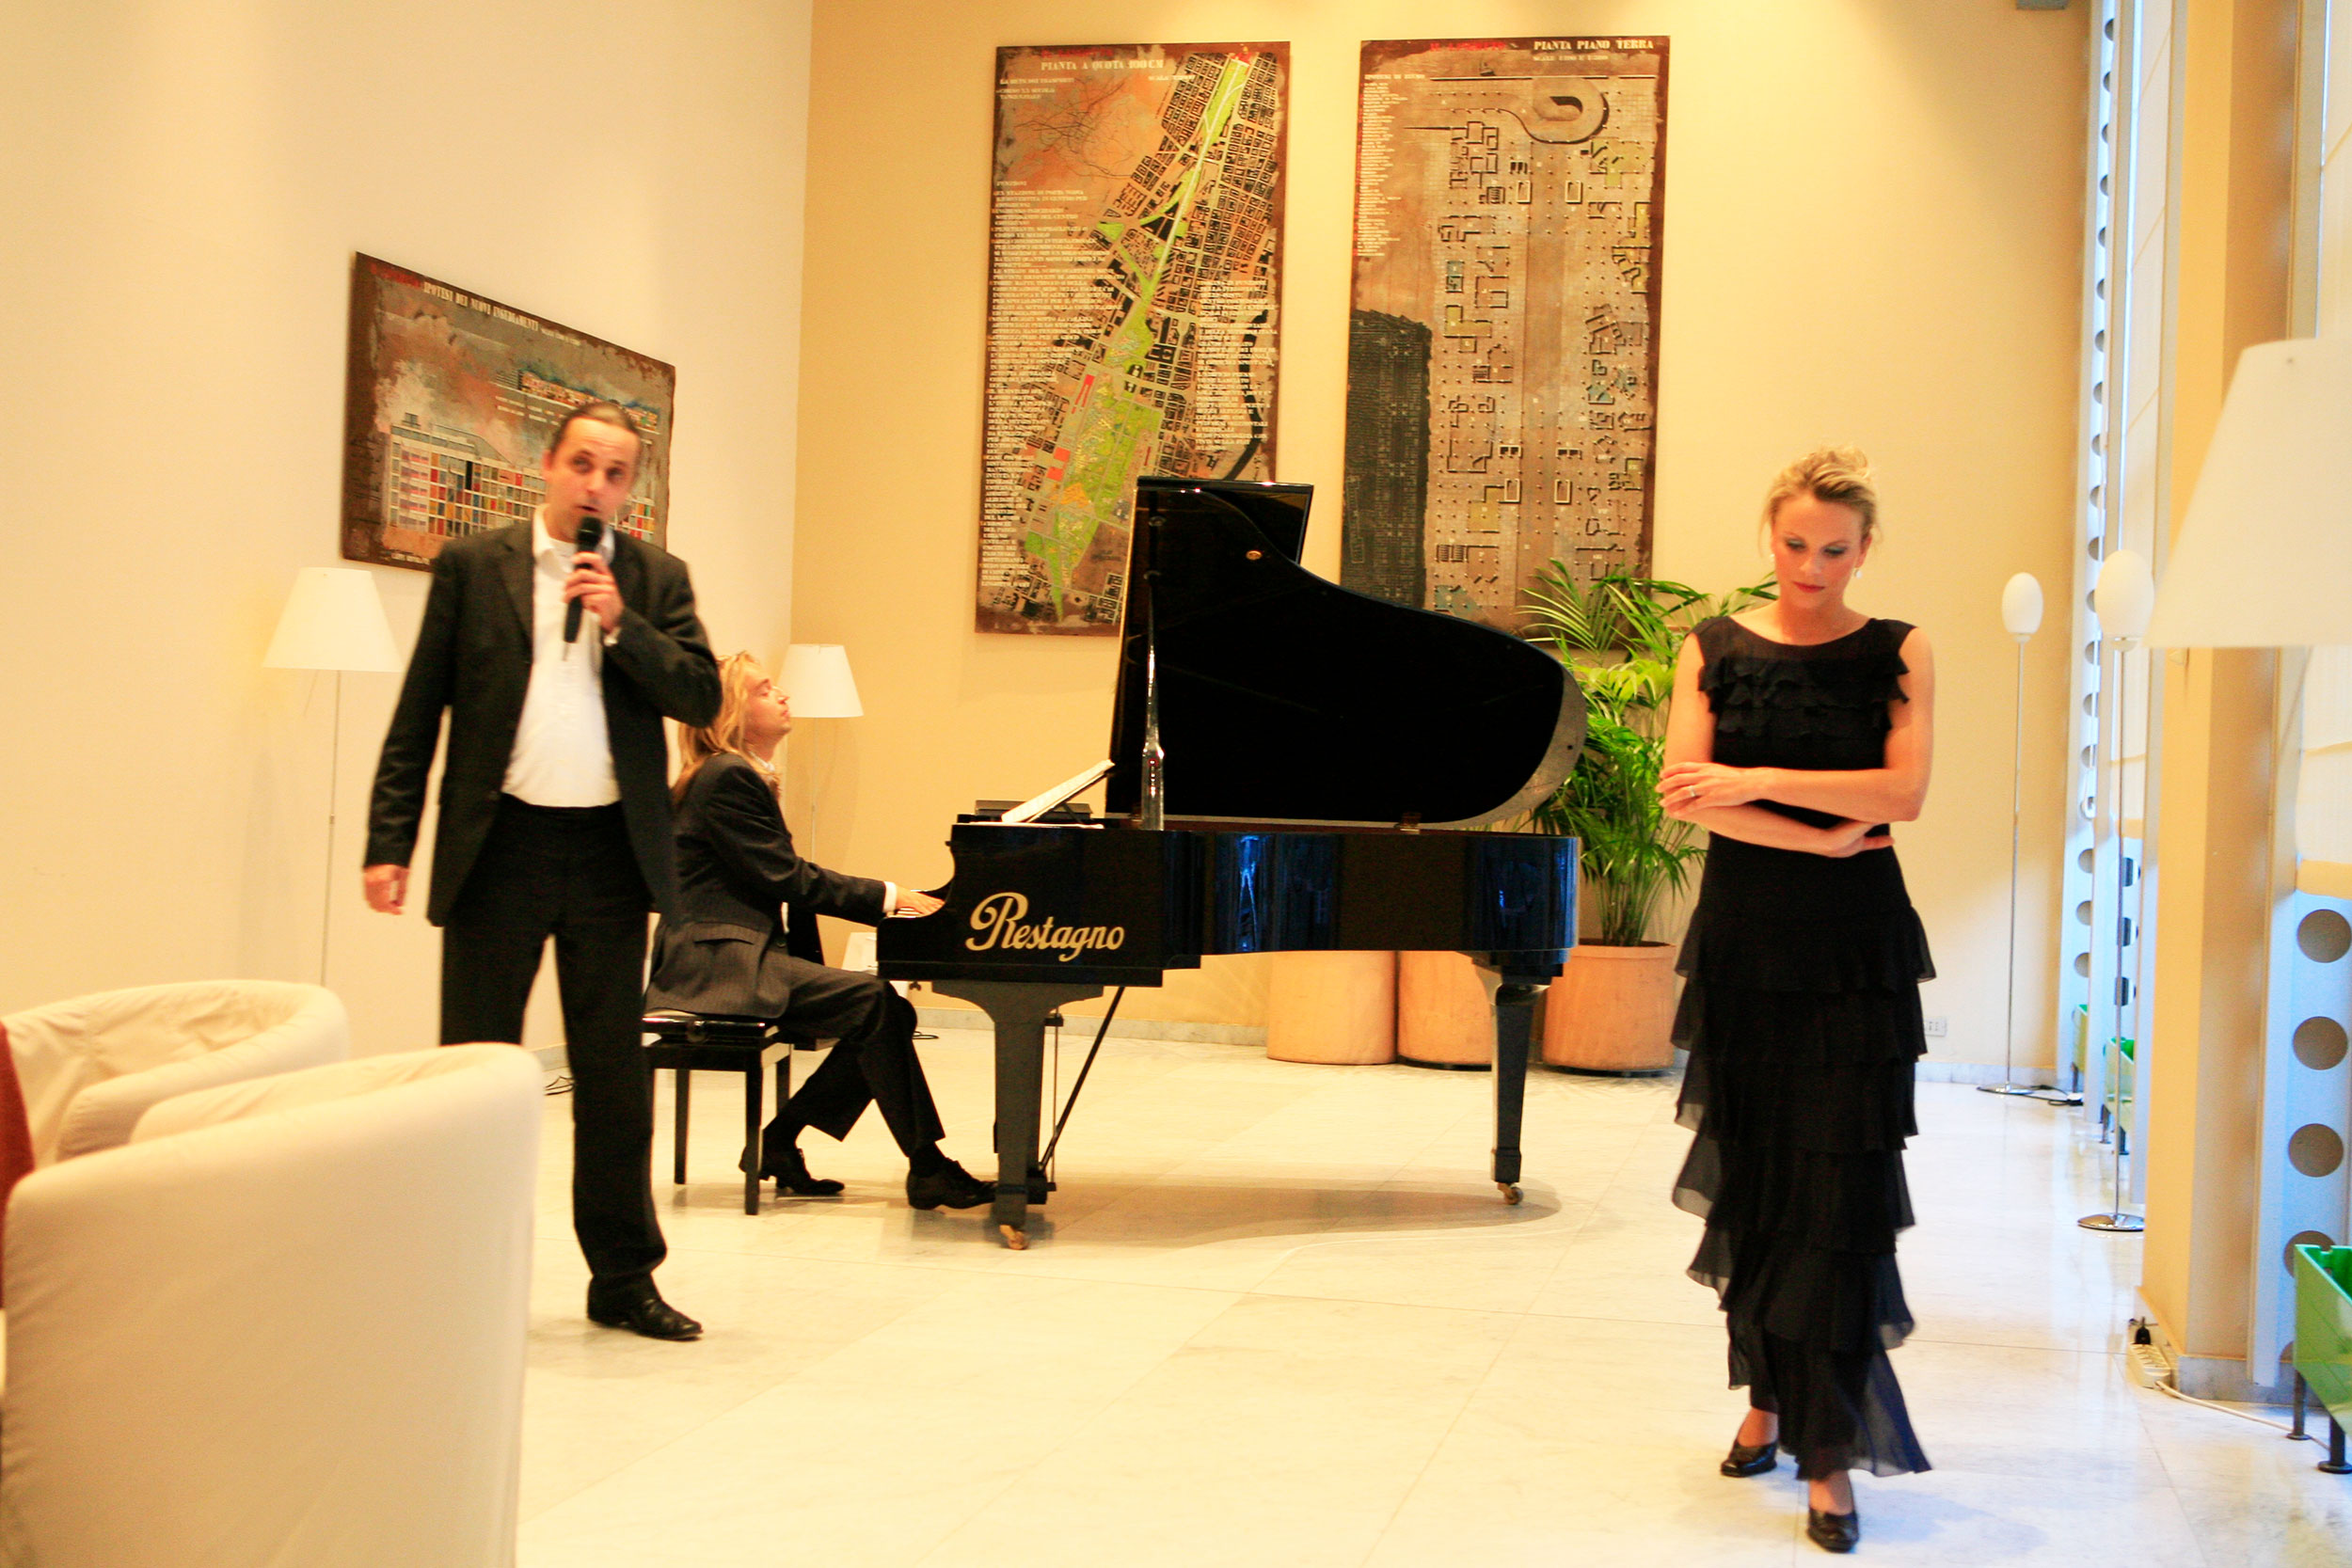 Jan Vayne and  Phanton of the Opera stars Janine Kitzen and Rob van Surksum during our diner.